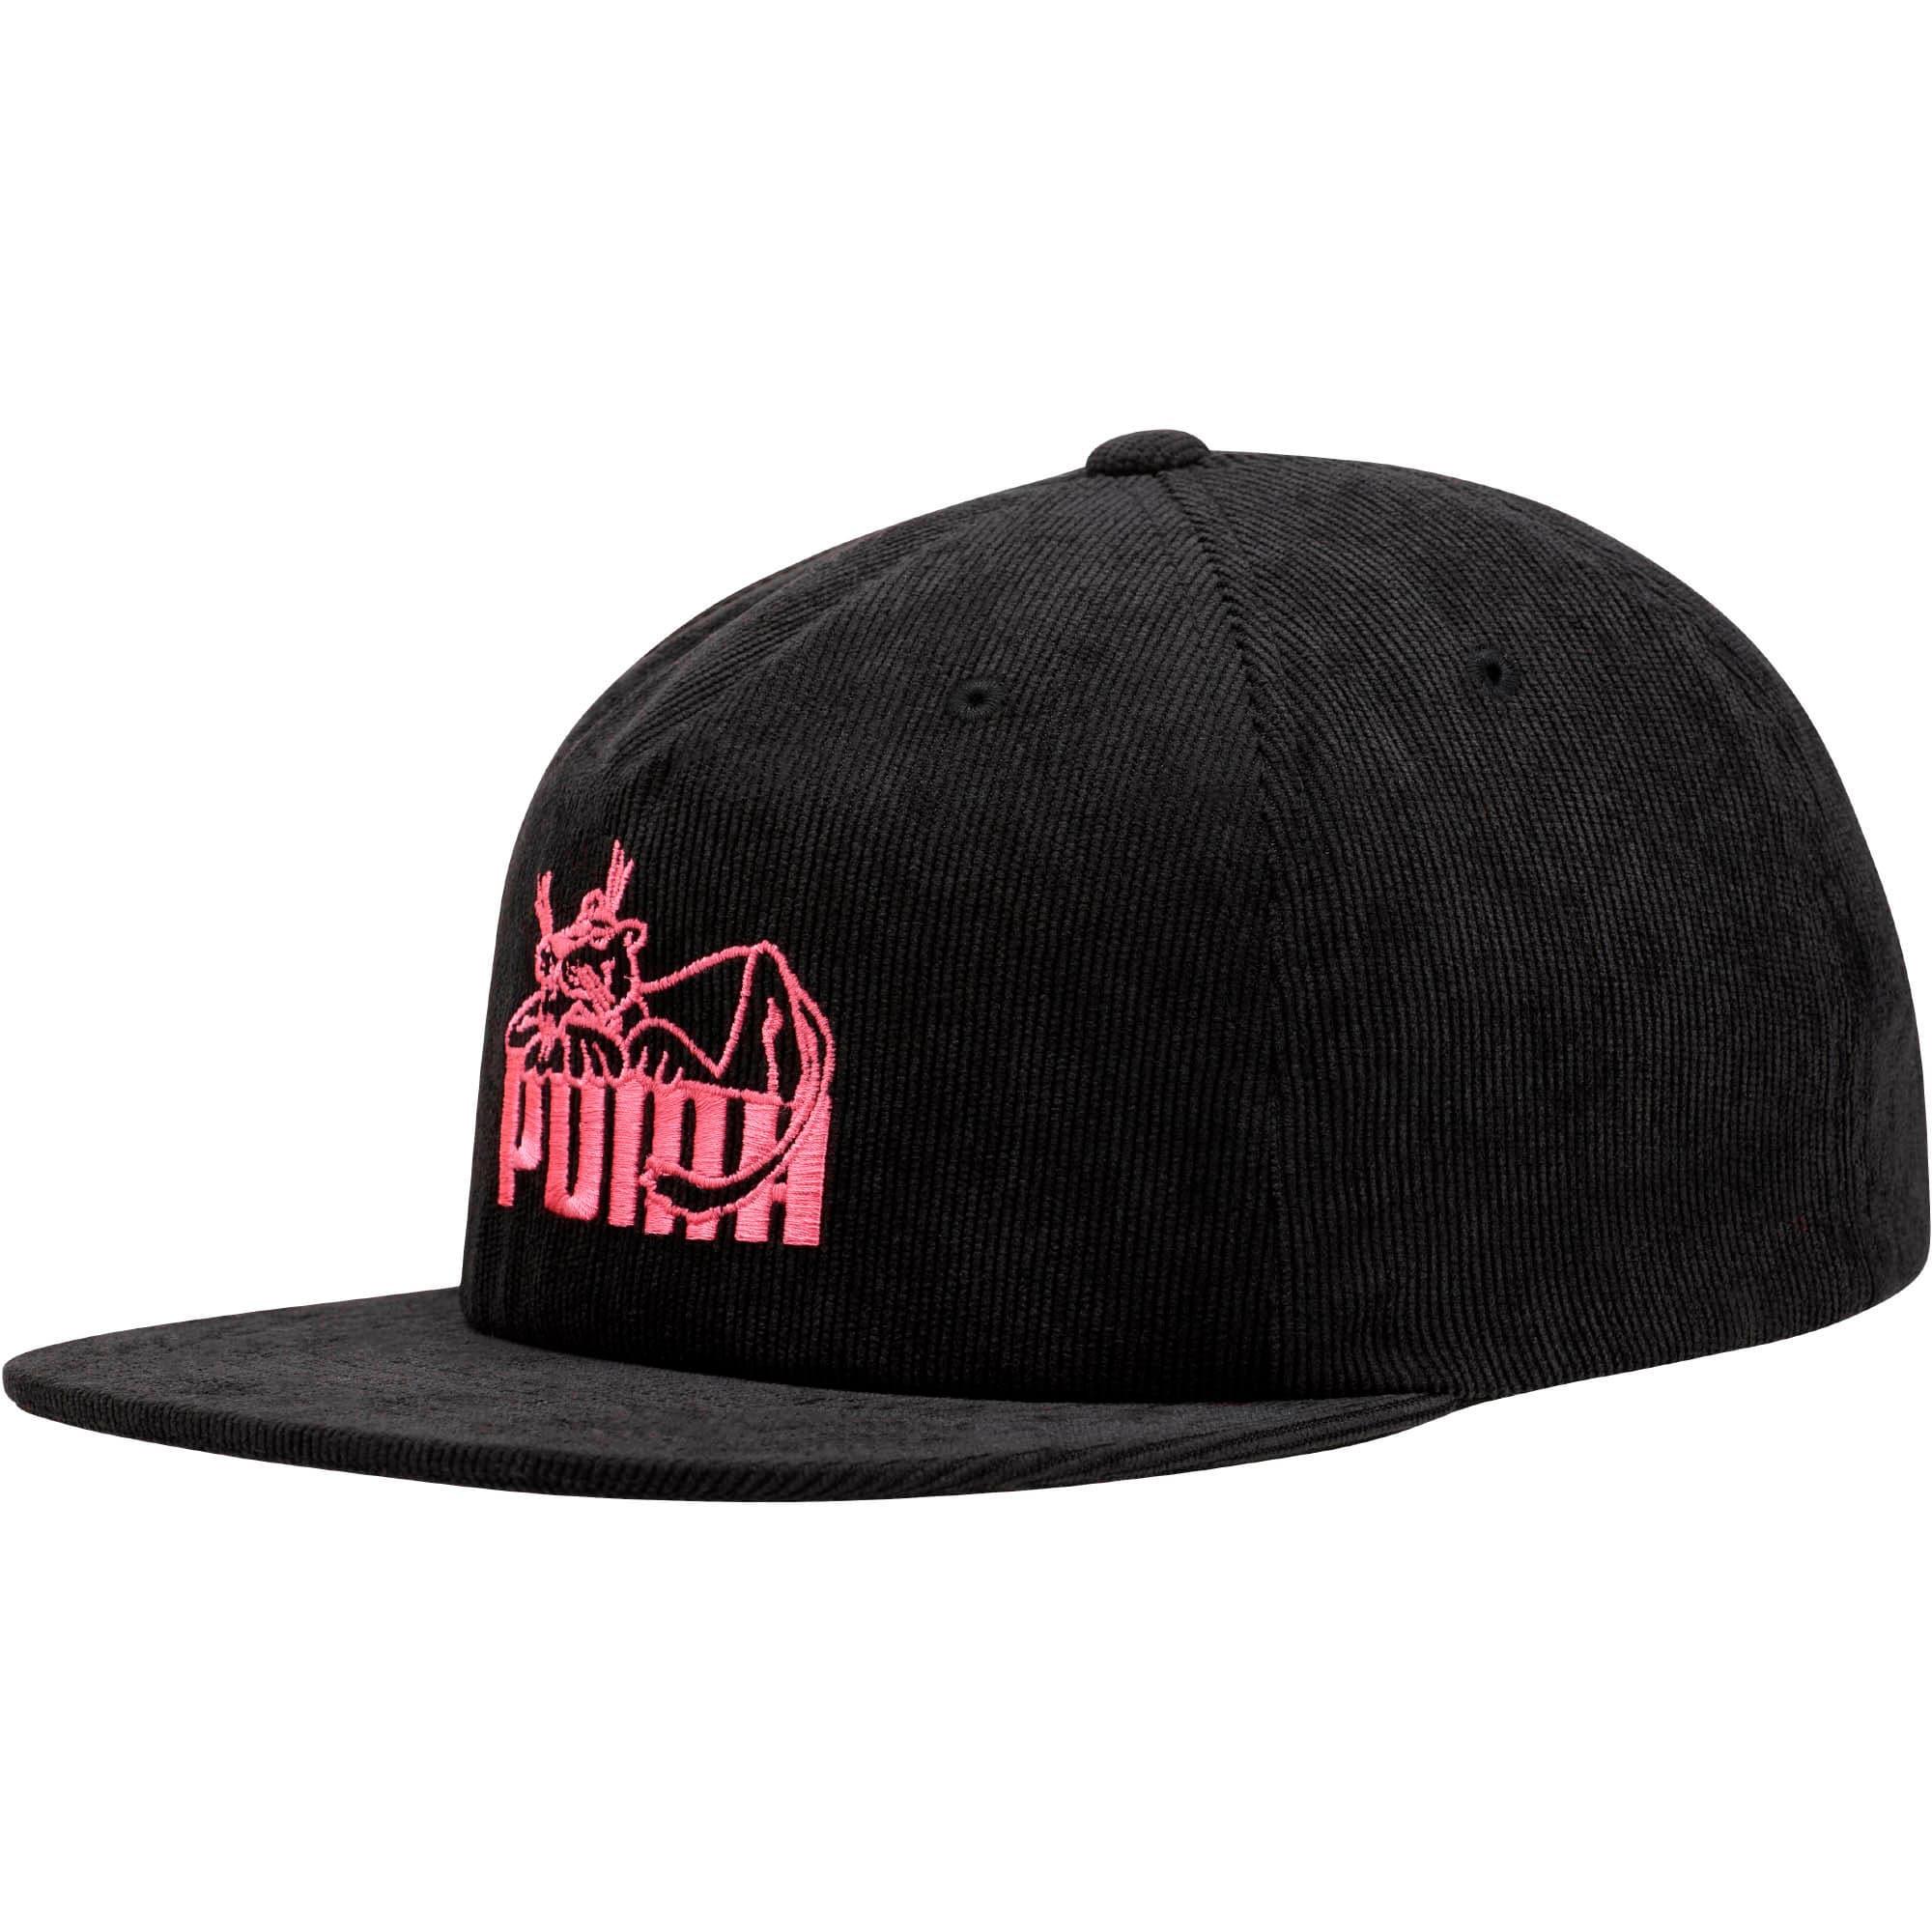 Thumbnail 1 of Core Super PUMA Flat Brim Hat, BLACK / PINK, medium